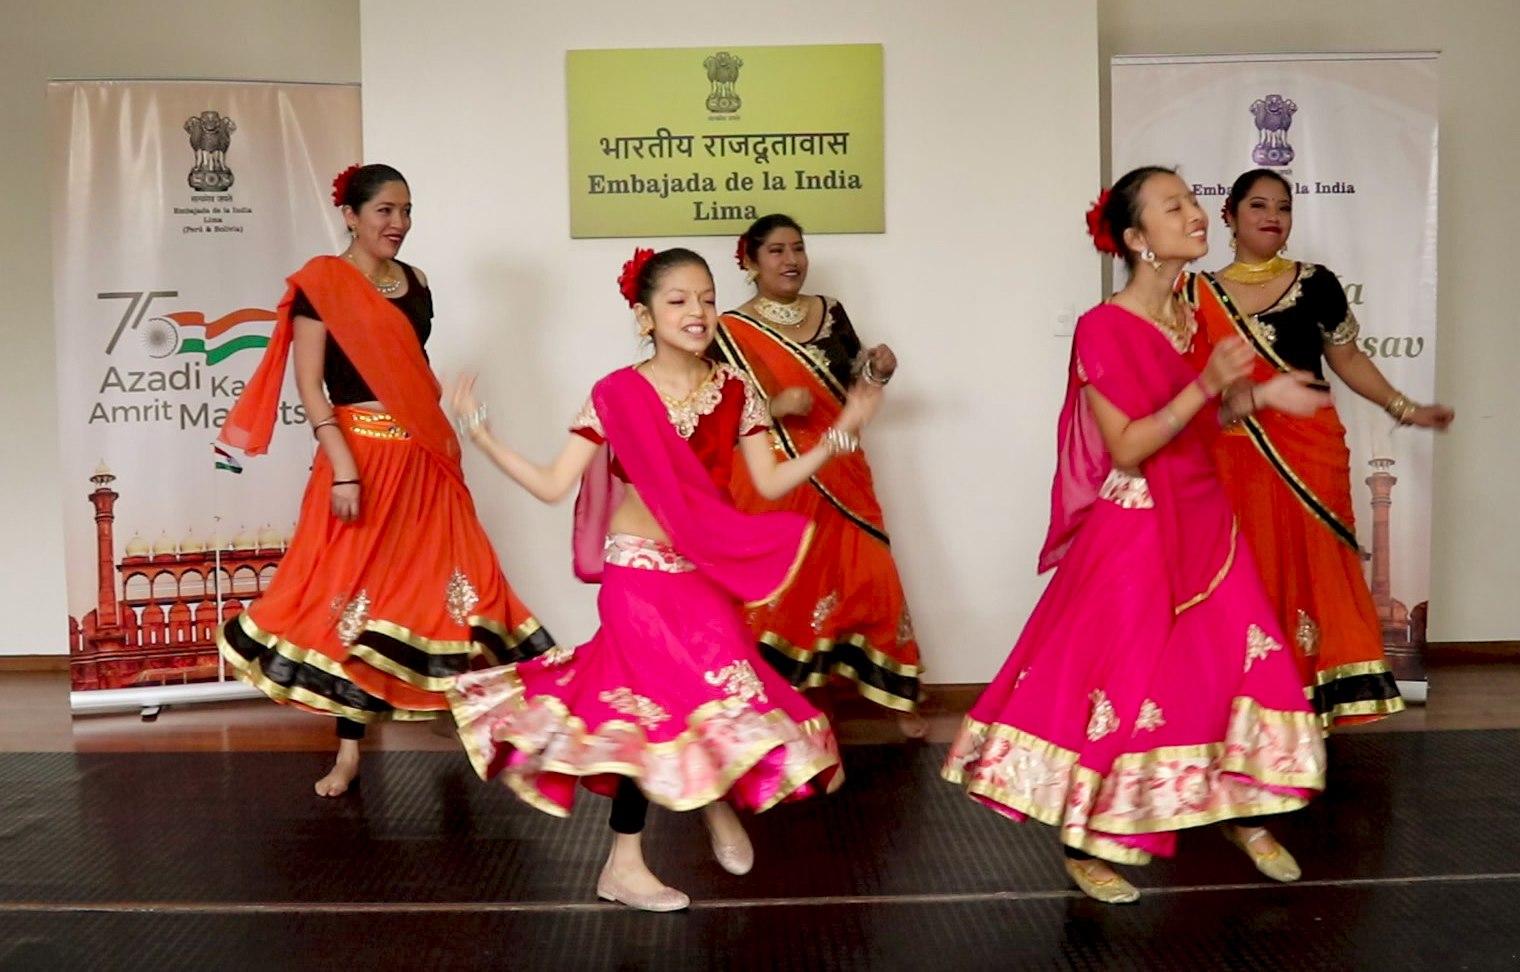 As part of #AzadiKaAmritMahotsav celebrations, under #IndiaWeek,  Embassy of India, Lima  organised an event manifesting Creative Dance in Indian films